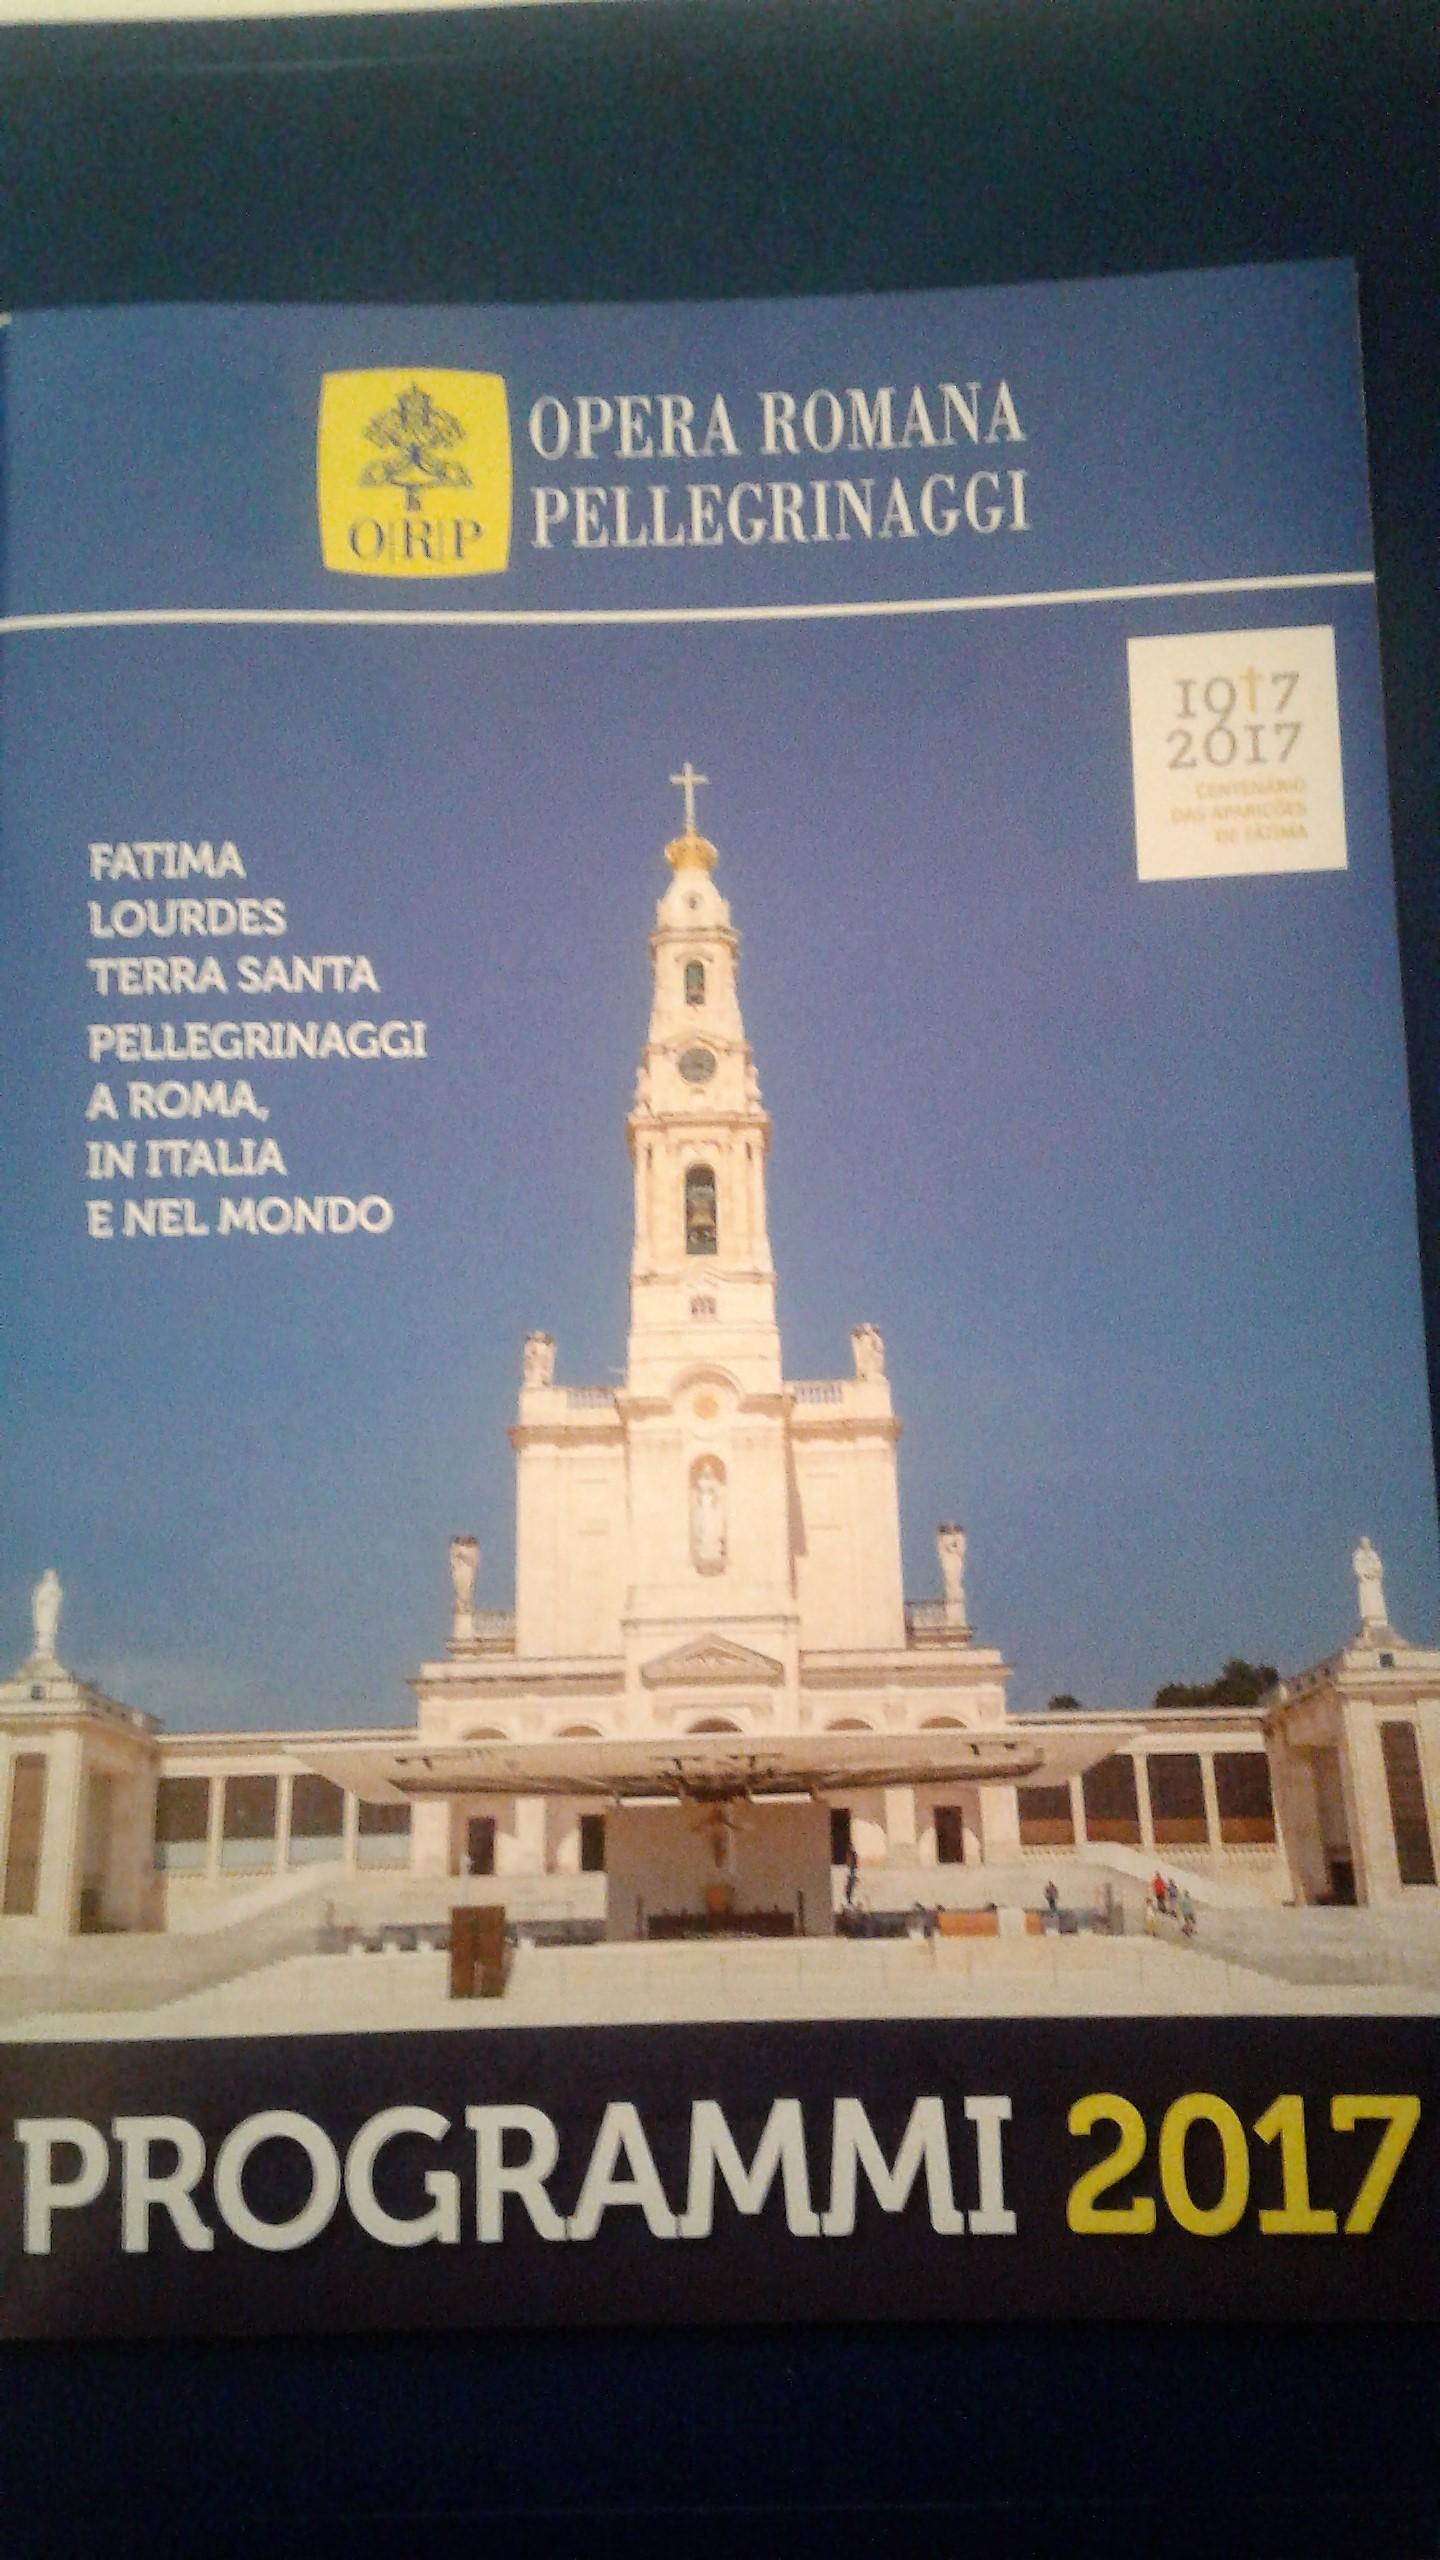 Catalogo 2017 Opera Romana Pellegrinaggi